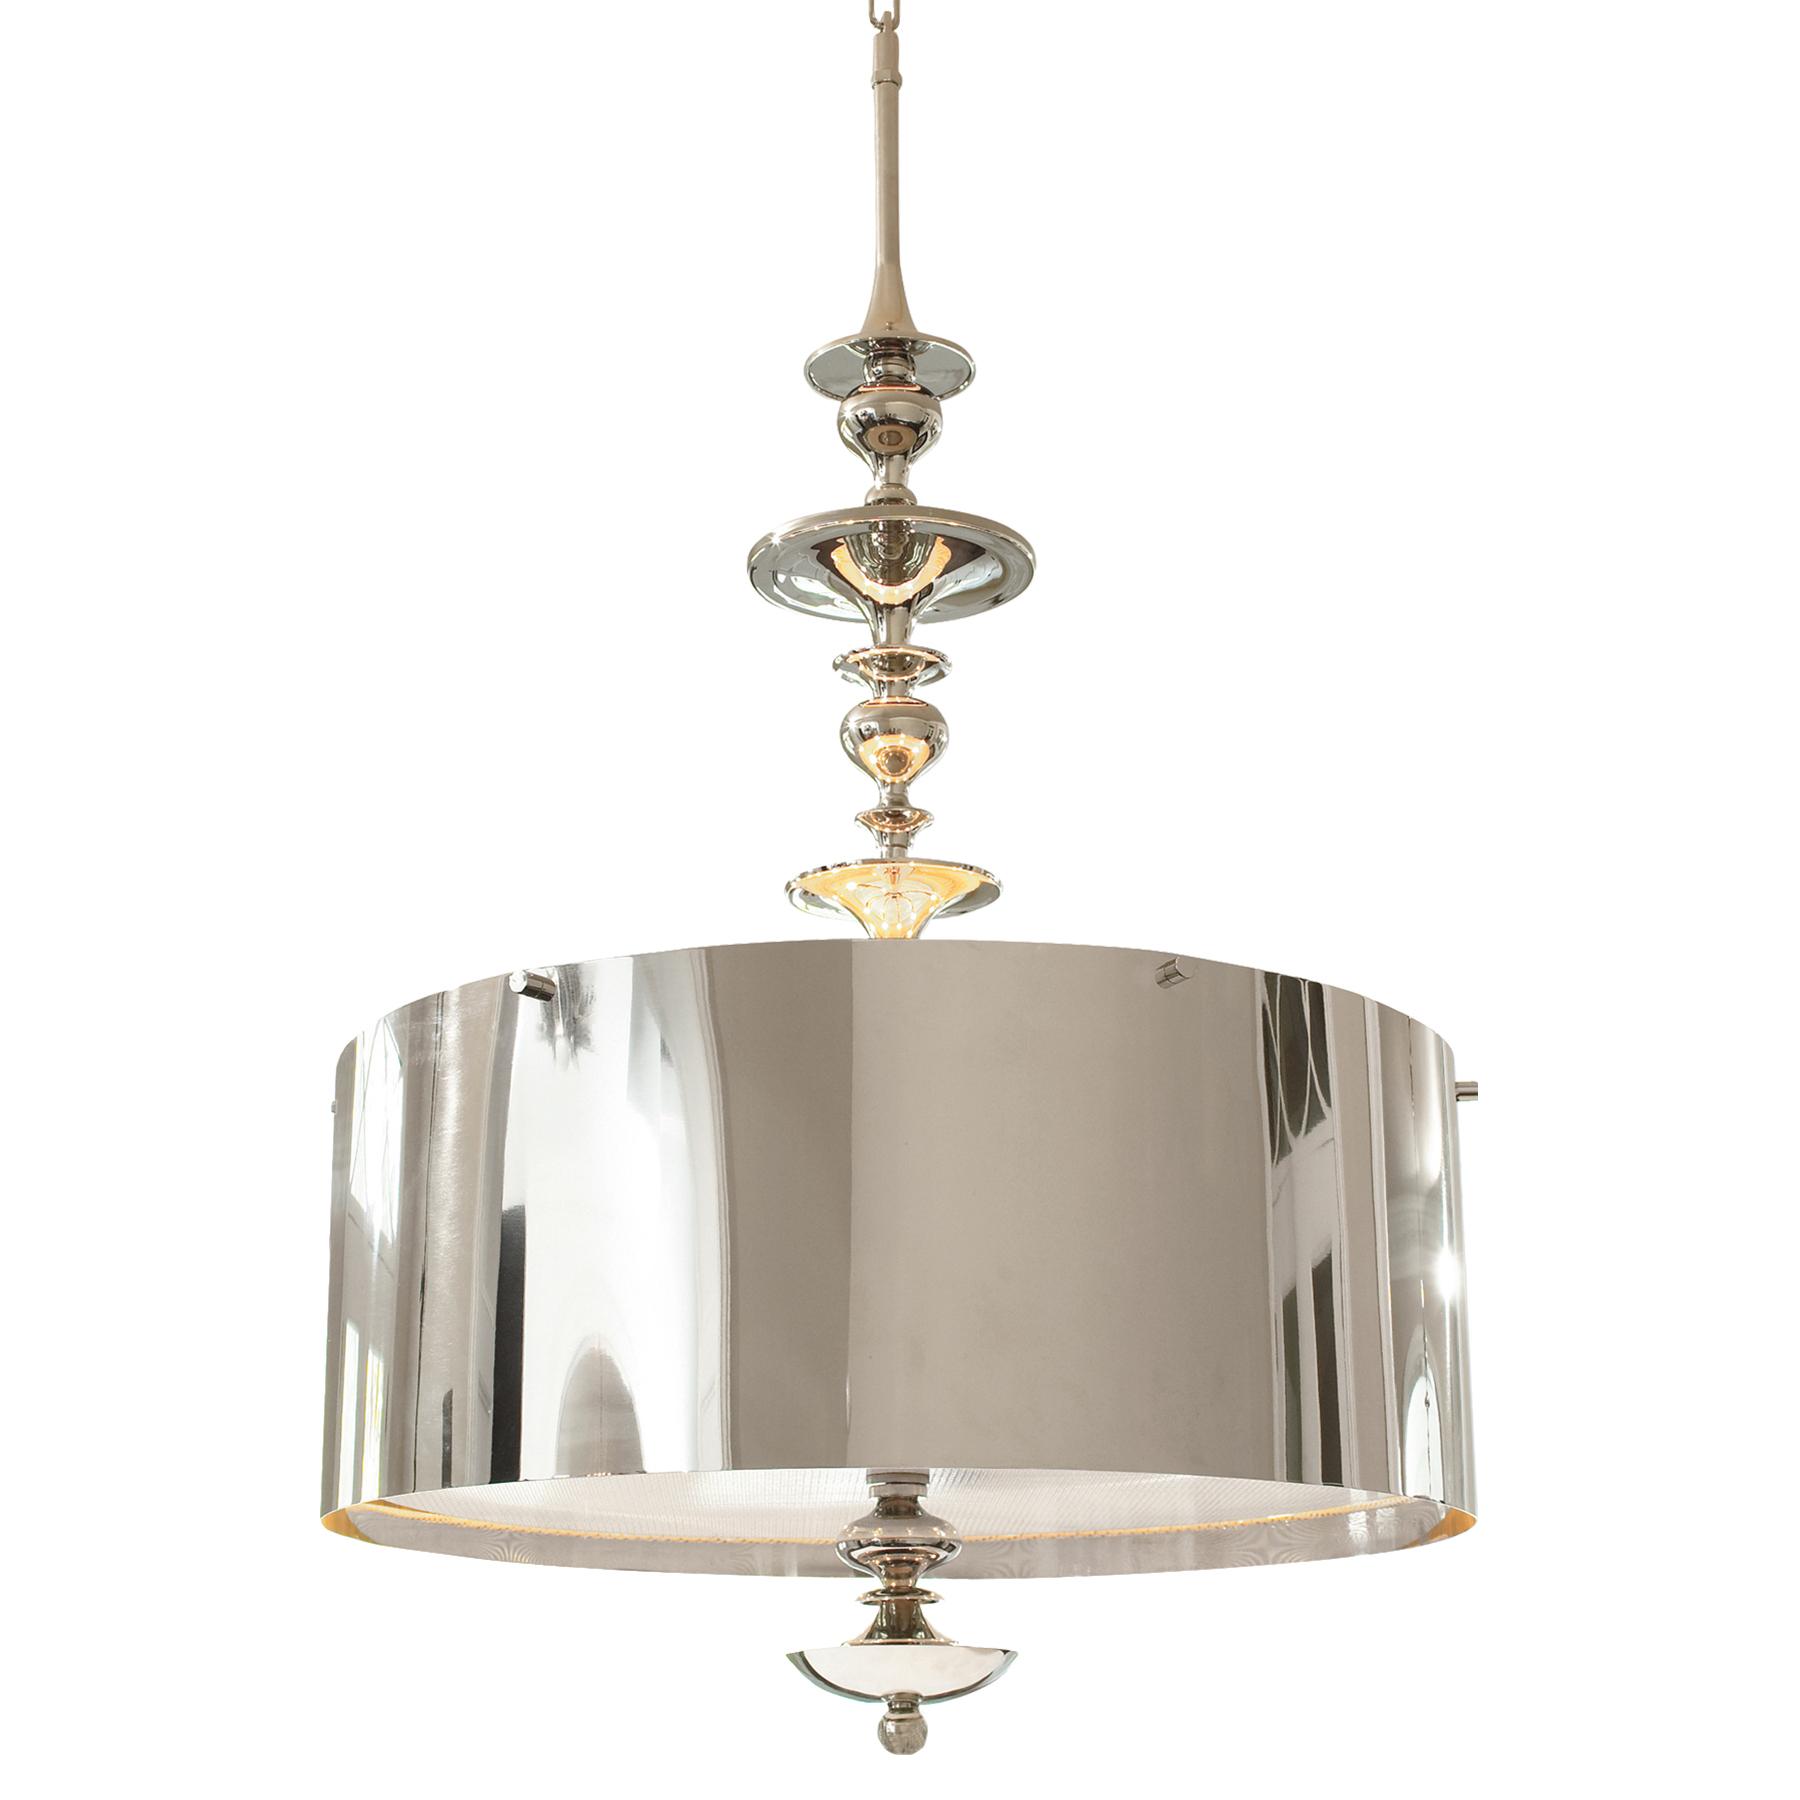 Karel Polished Nickel Hollywood Regency Pendant Lamp - 39.25 Inch